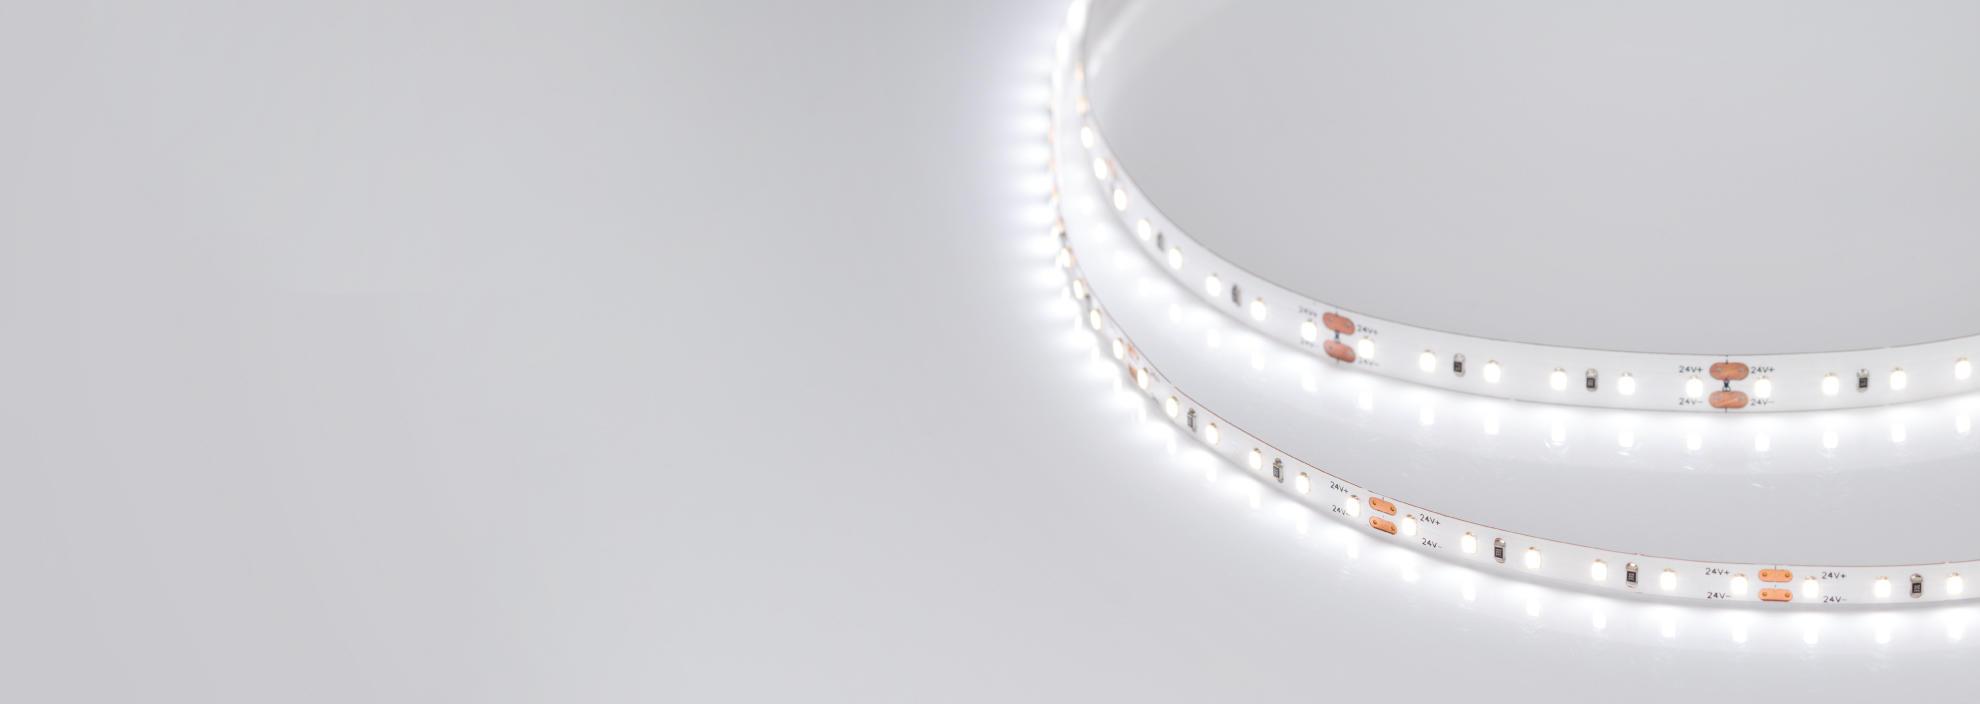 Узкая & Тонкая светодиодная лента 4mm Microled